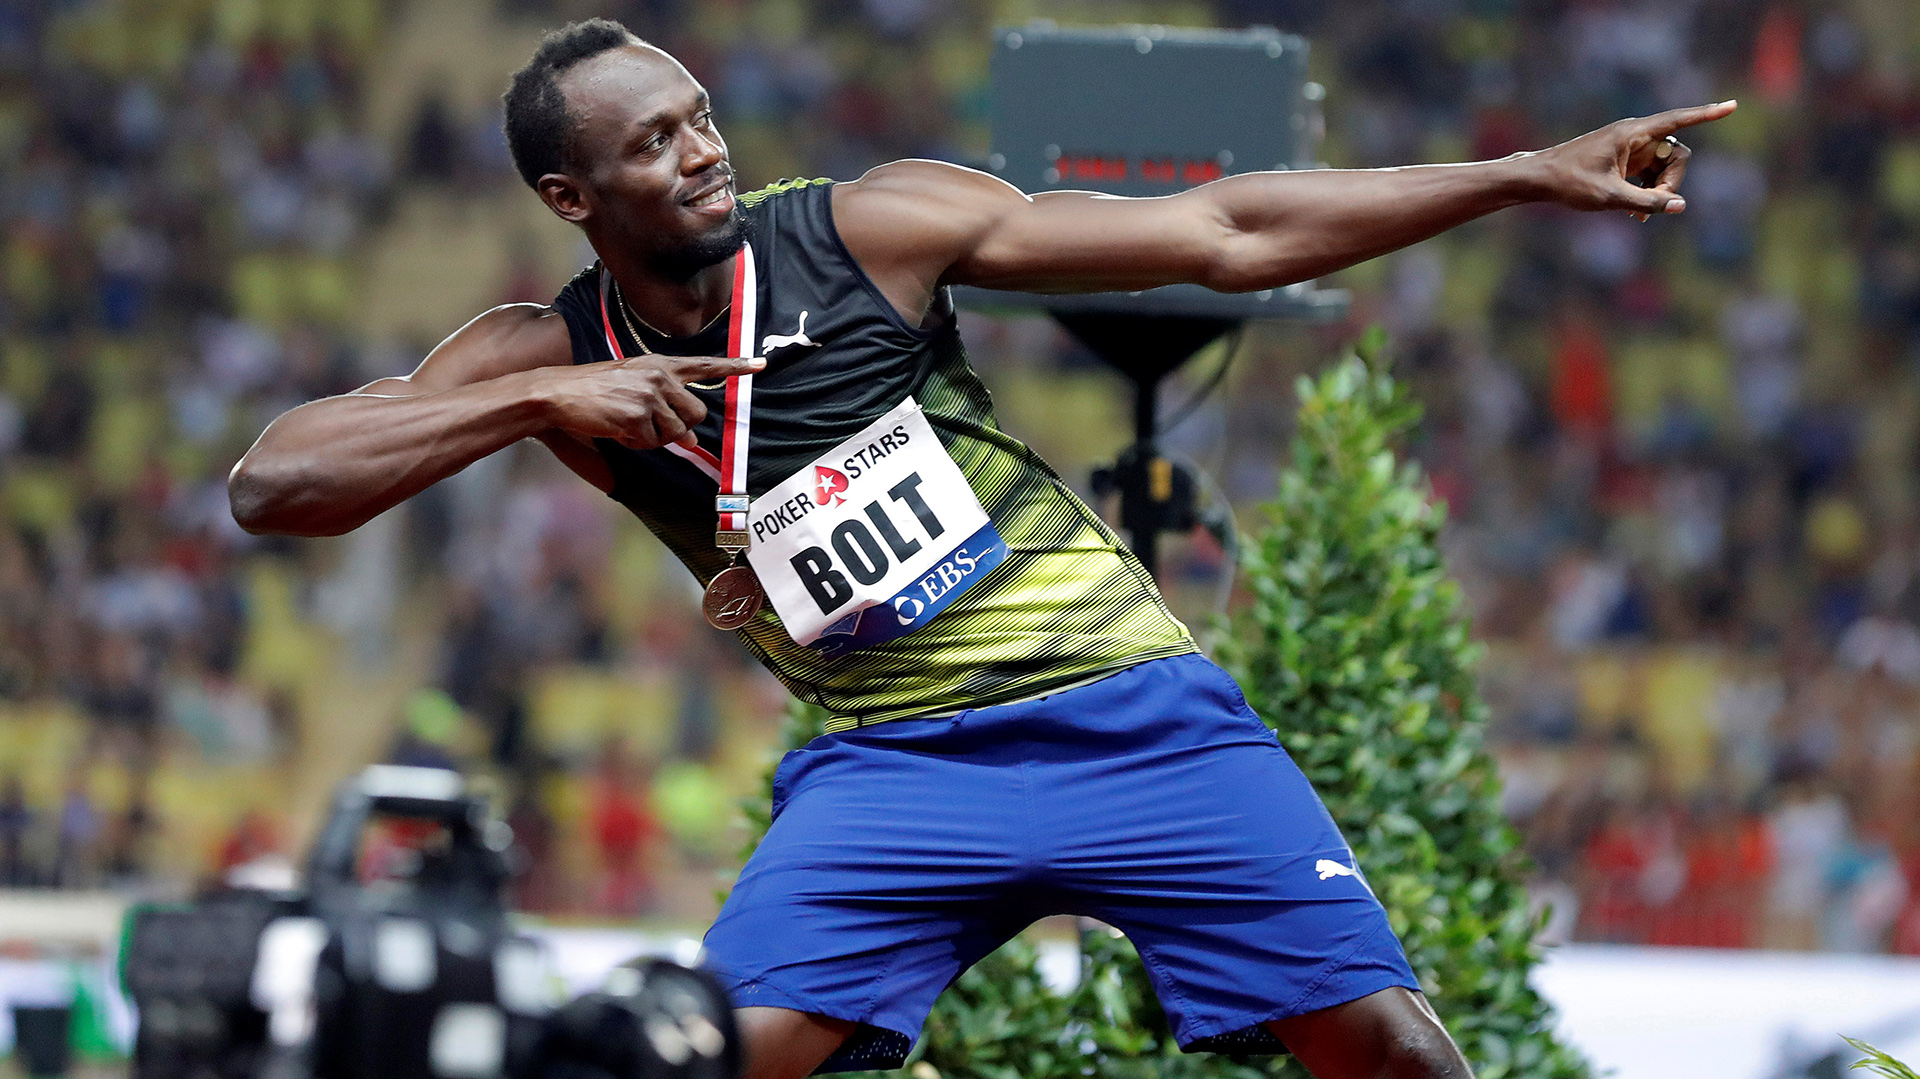 Antes de disputar el Mundial en Londres, Usain Bolt reapareció en laDiamond League en Mónaco (Reuters)